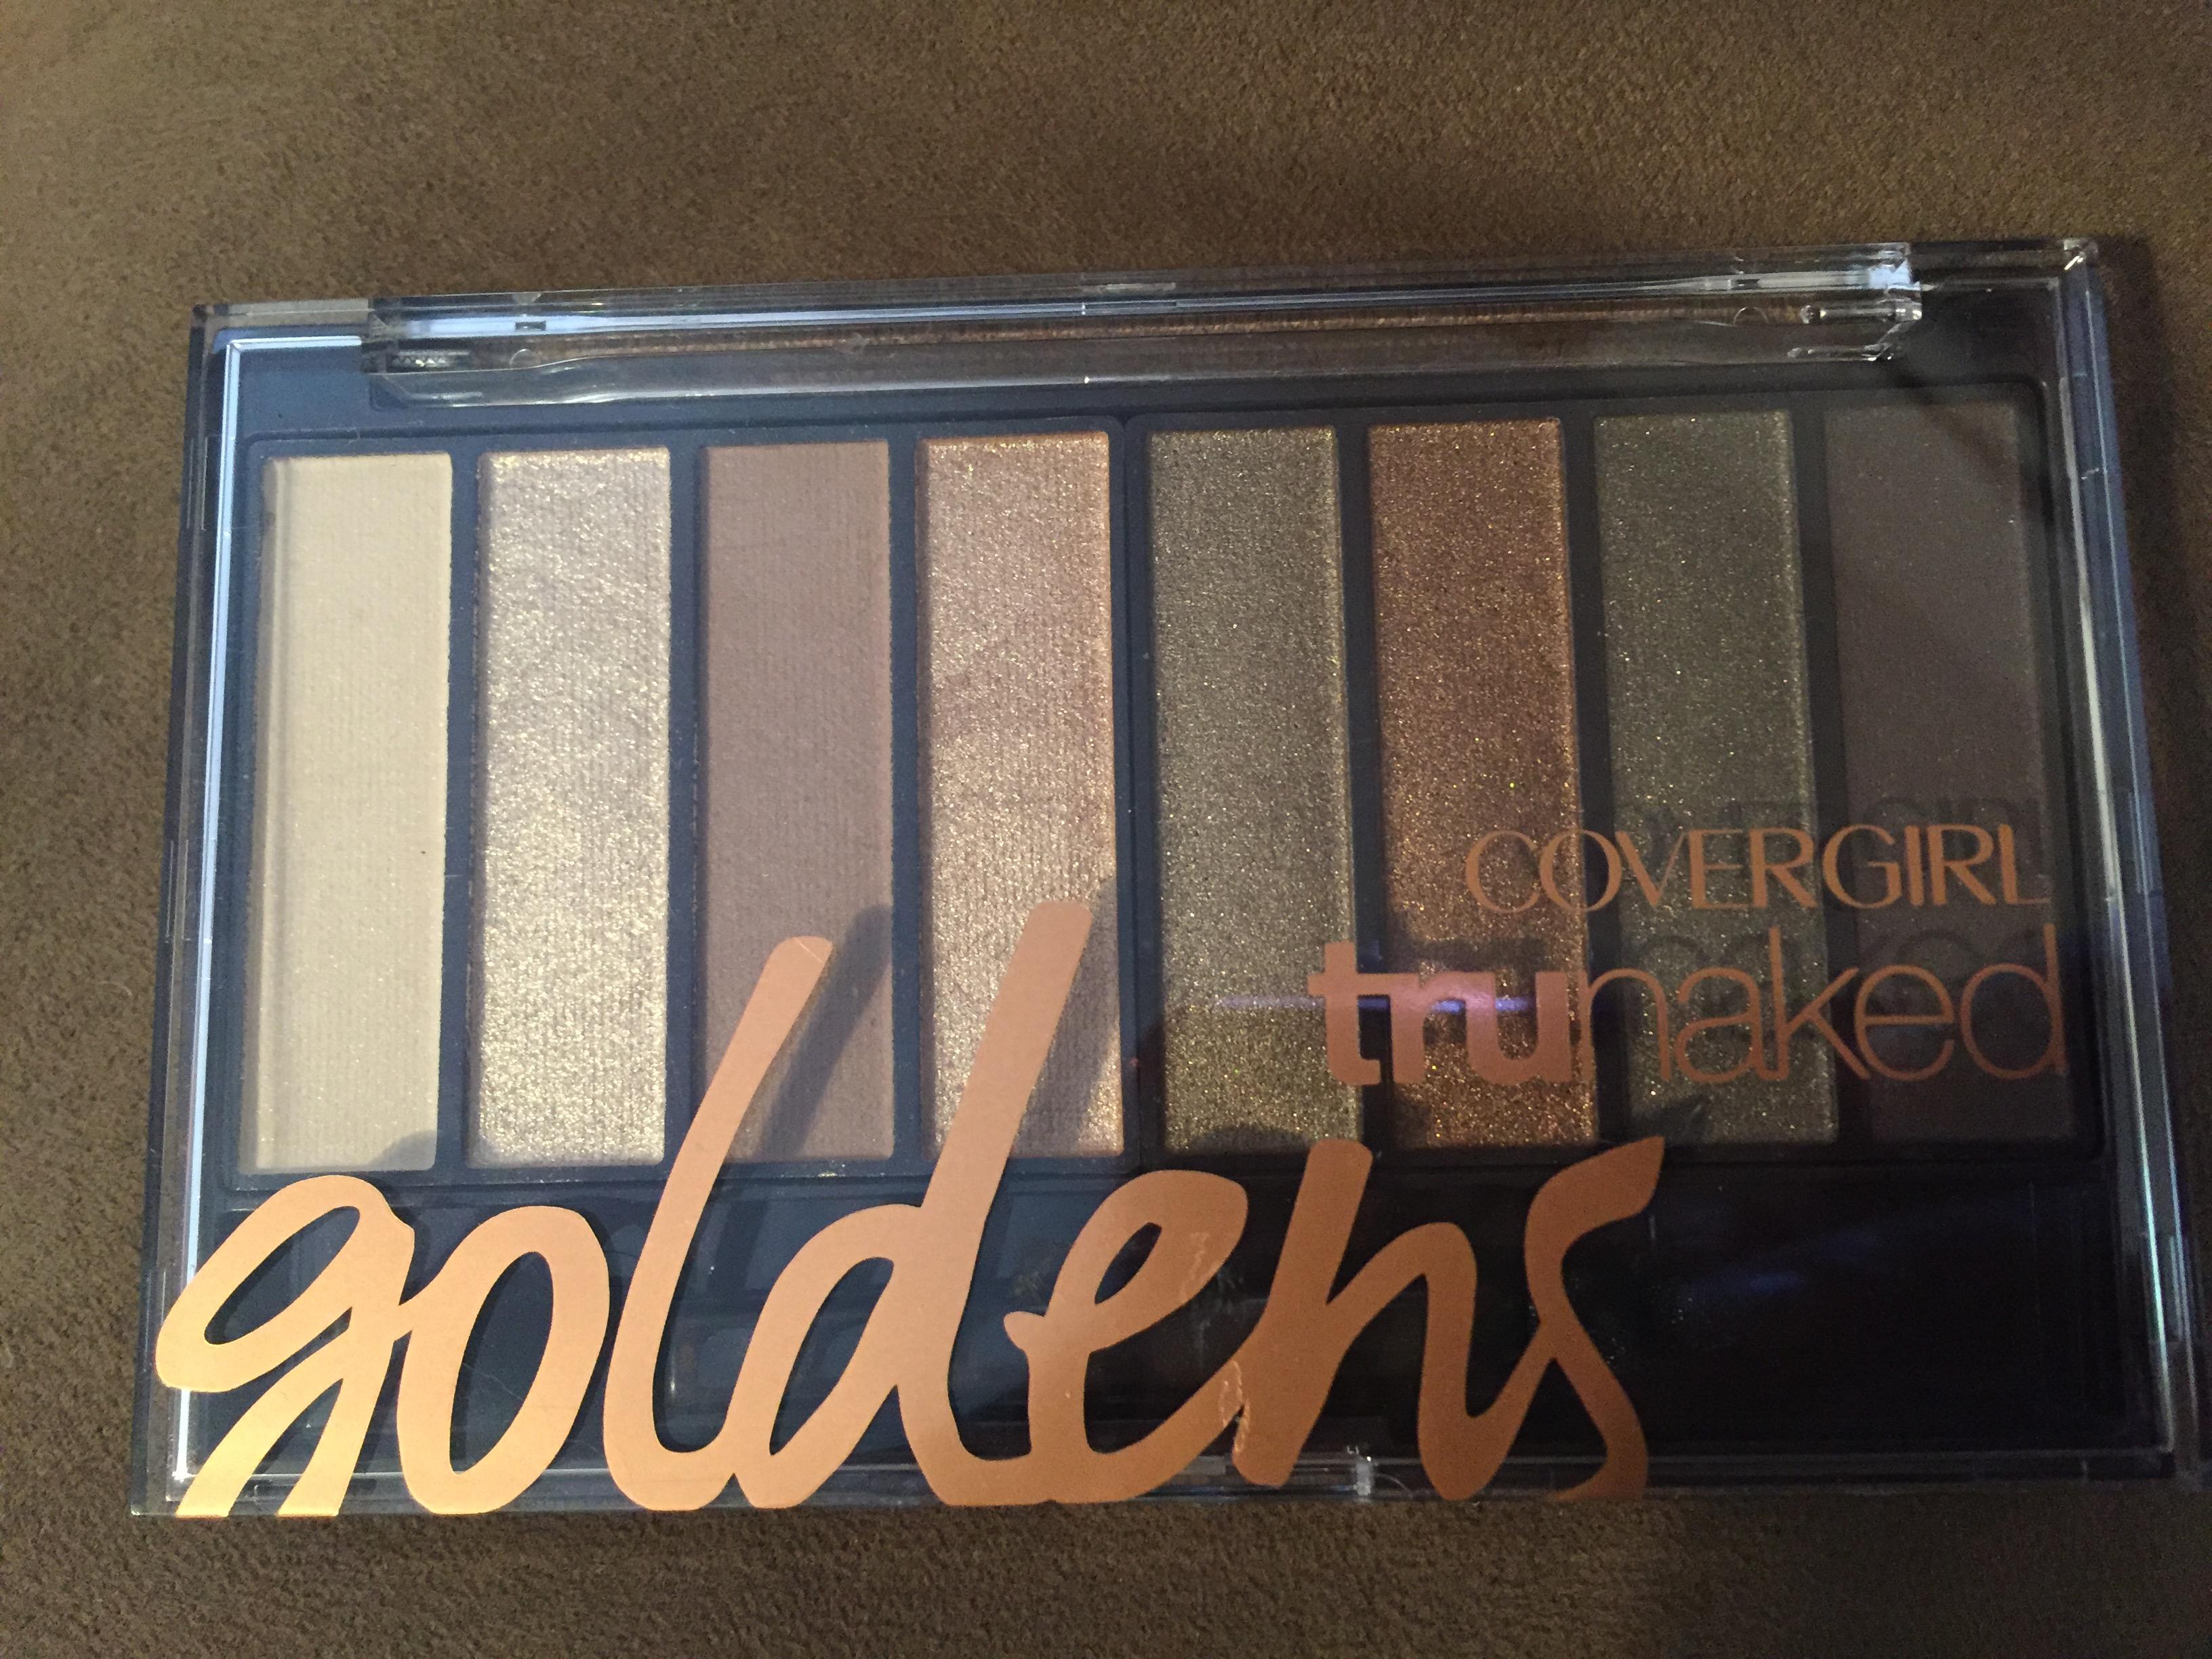 covergirl-trunaked-eyeshadow-palette-1